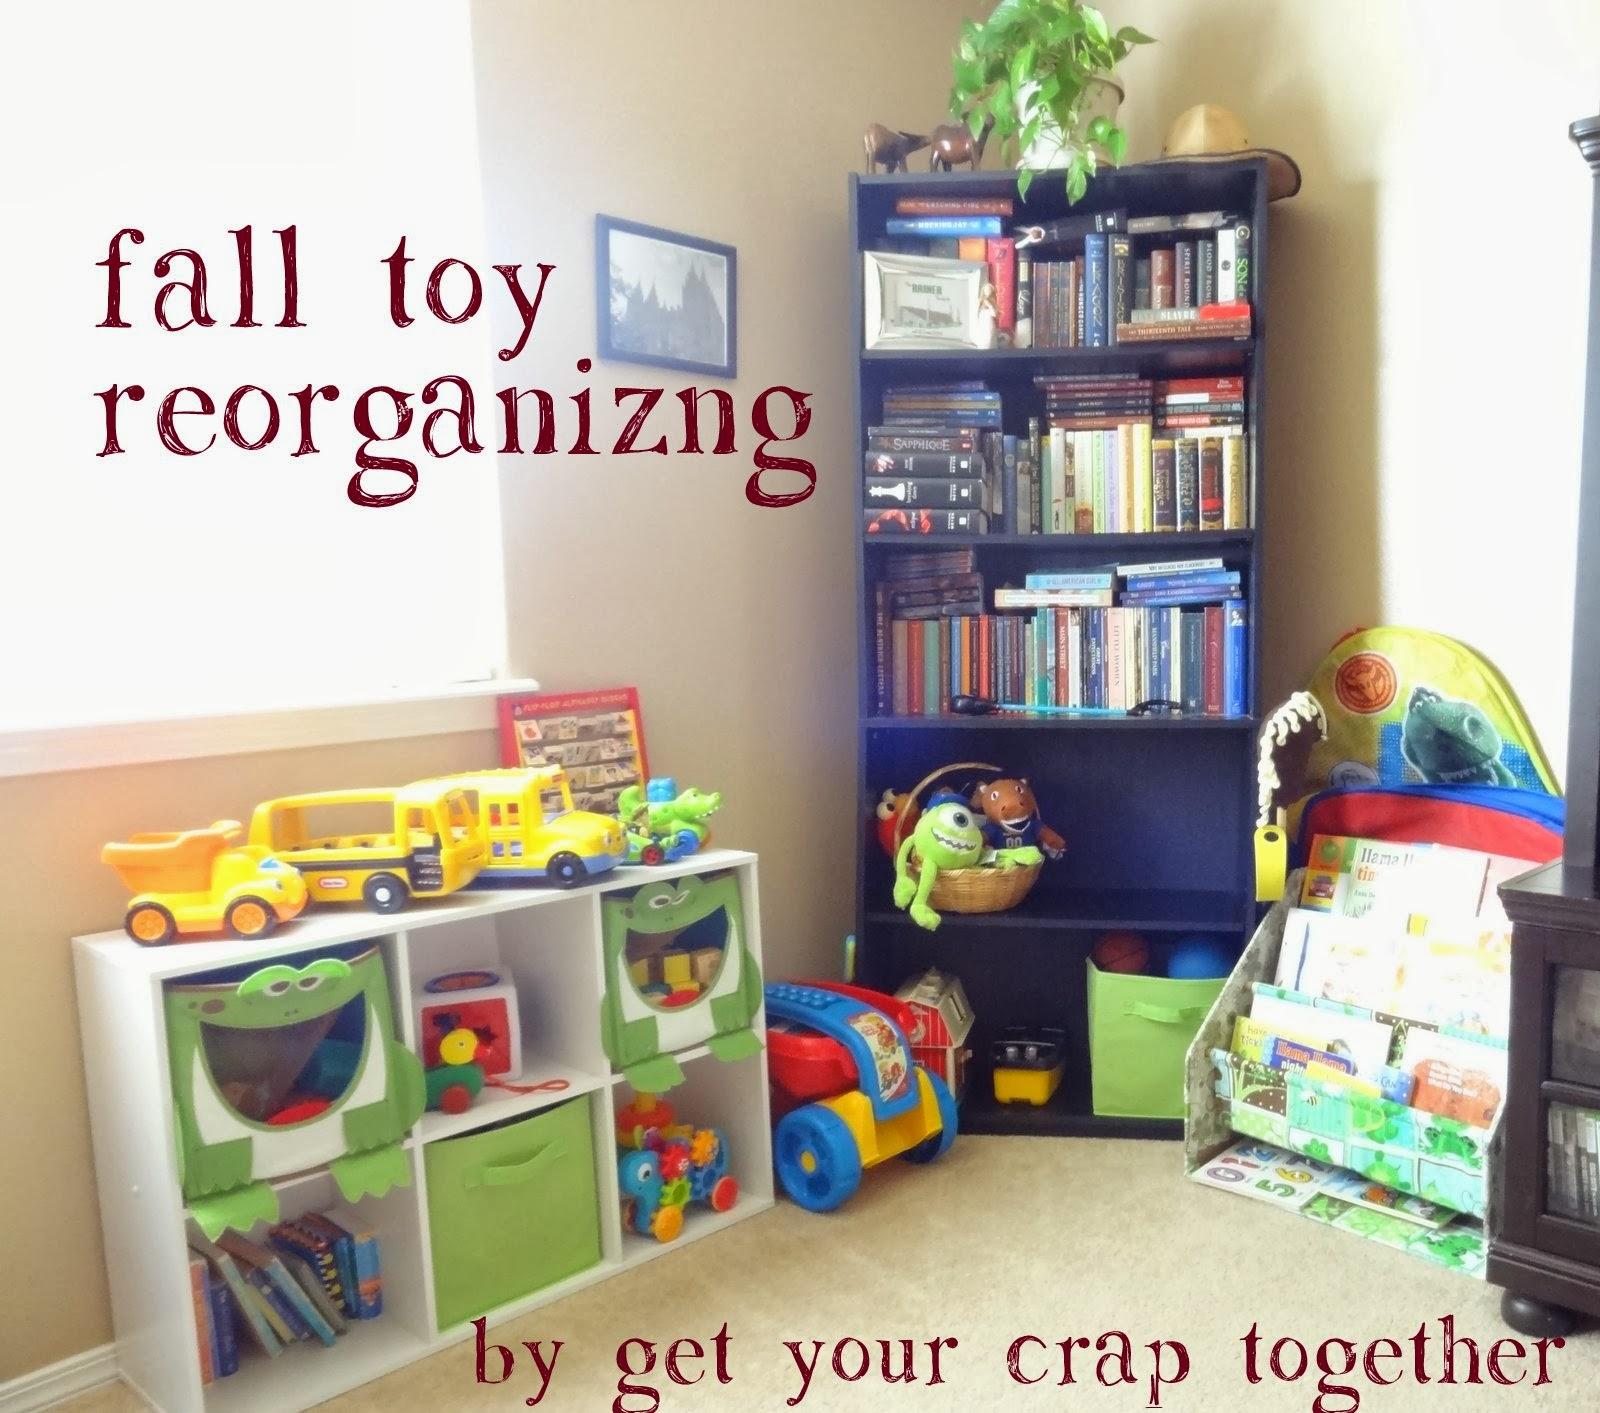 Reorganizing Room: Fall Toy Reorganizing